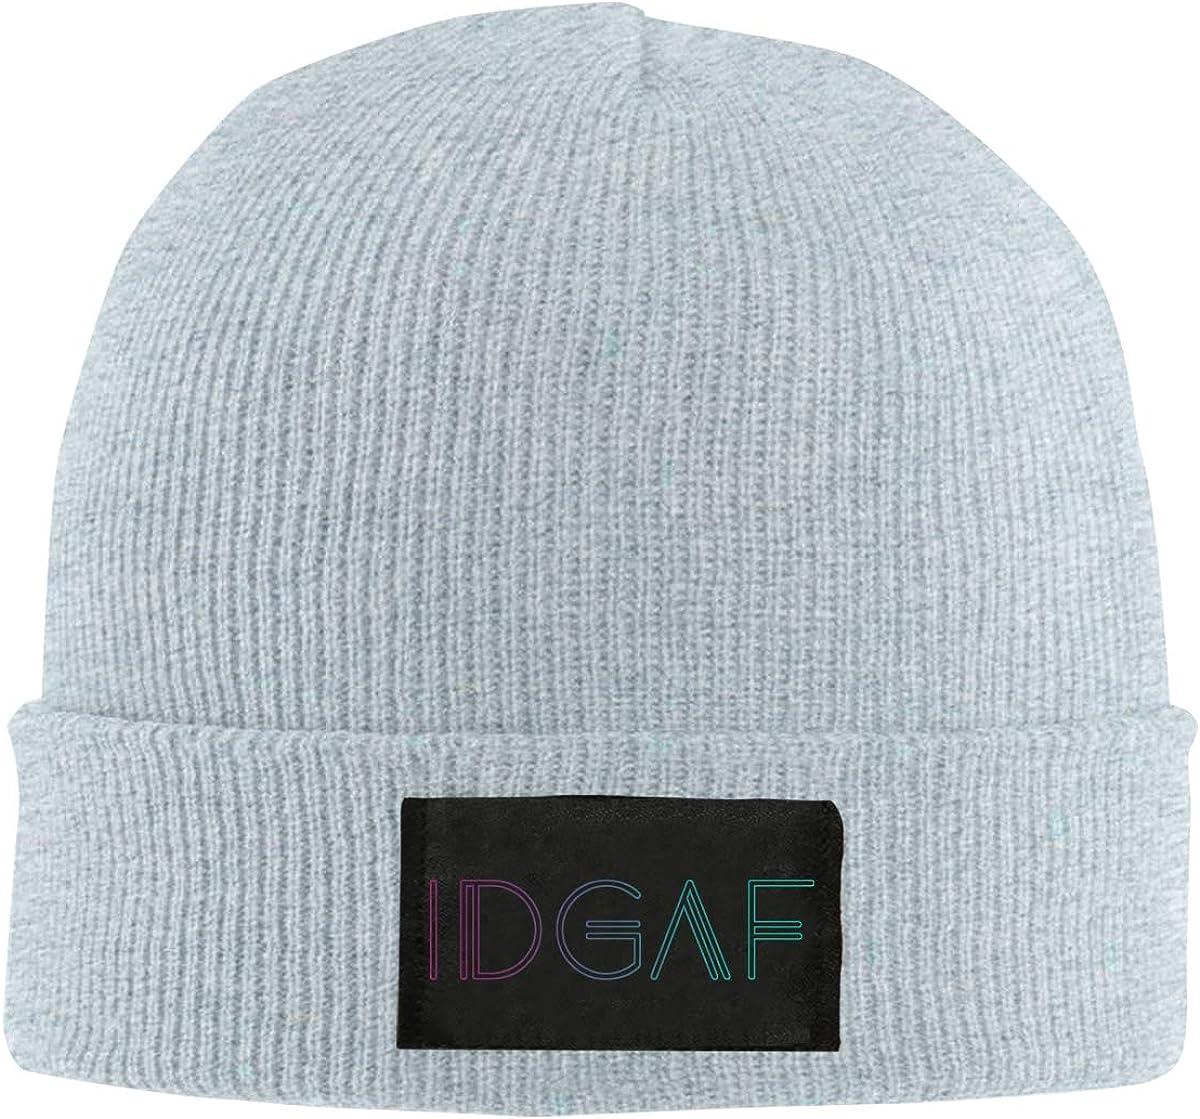 IDGAF Men /& Womens Knitted Hat Stretchy Skull Cap